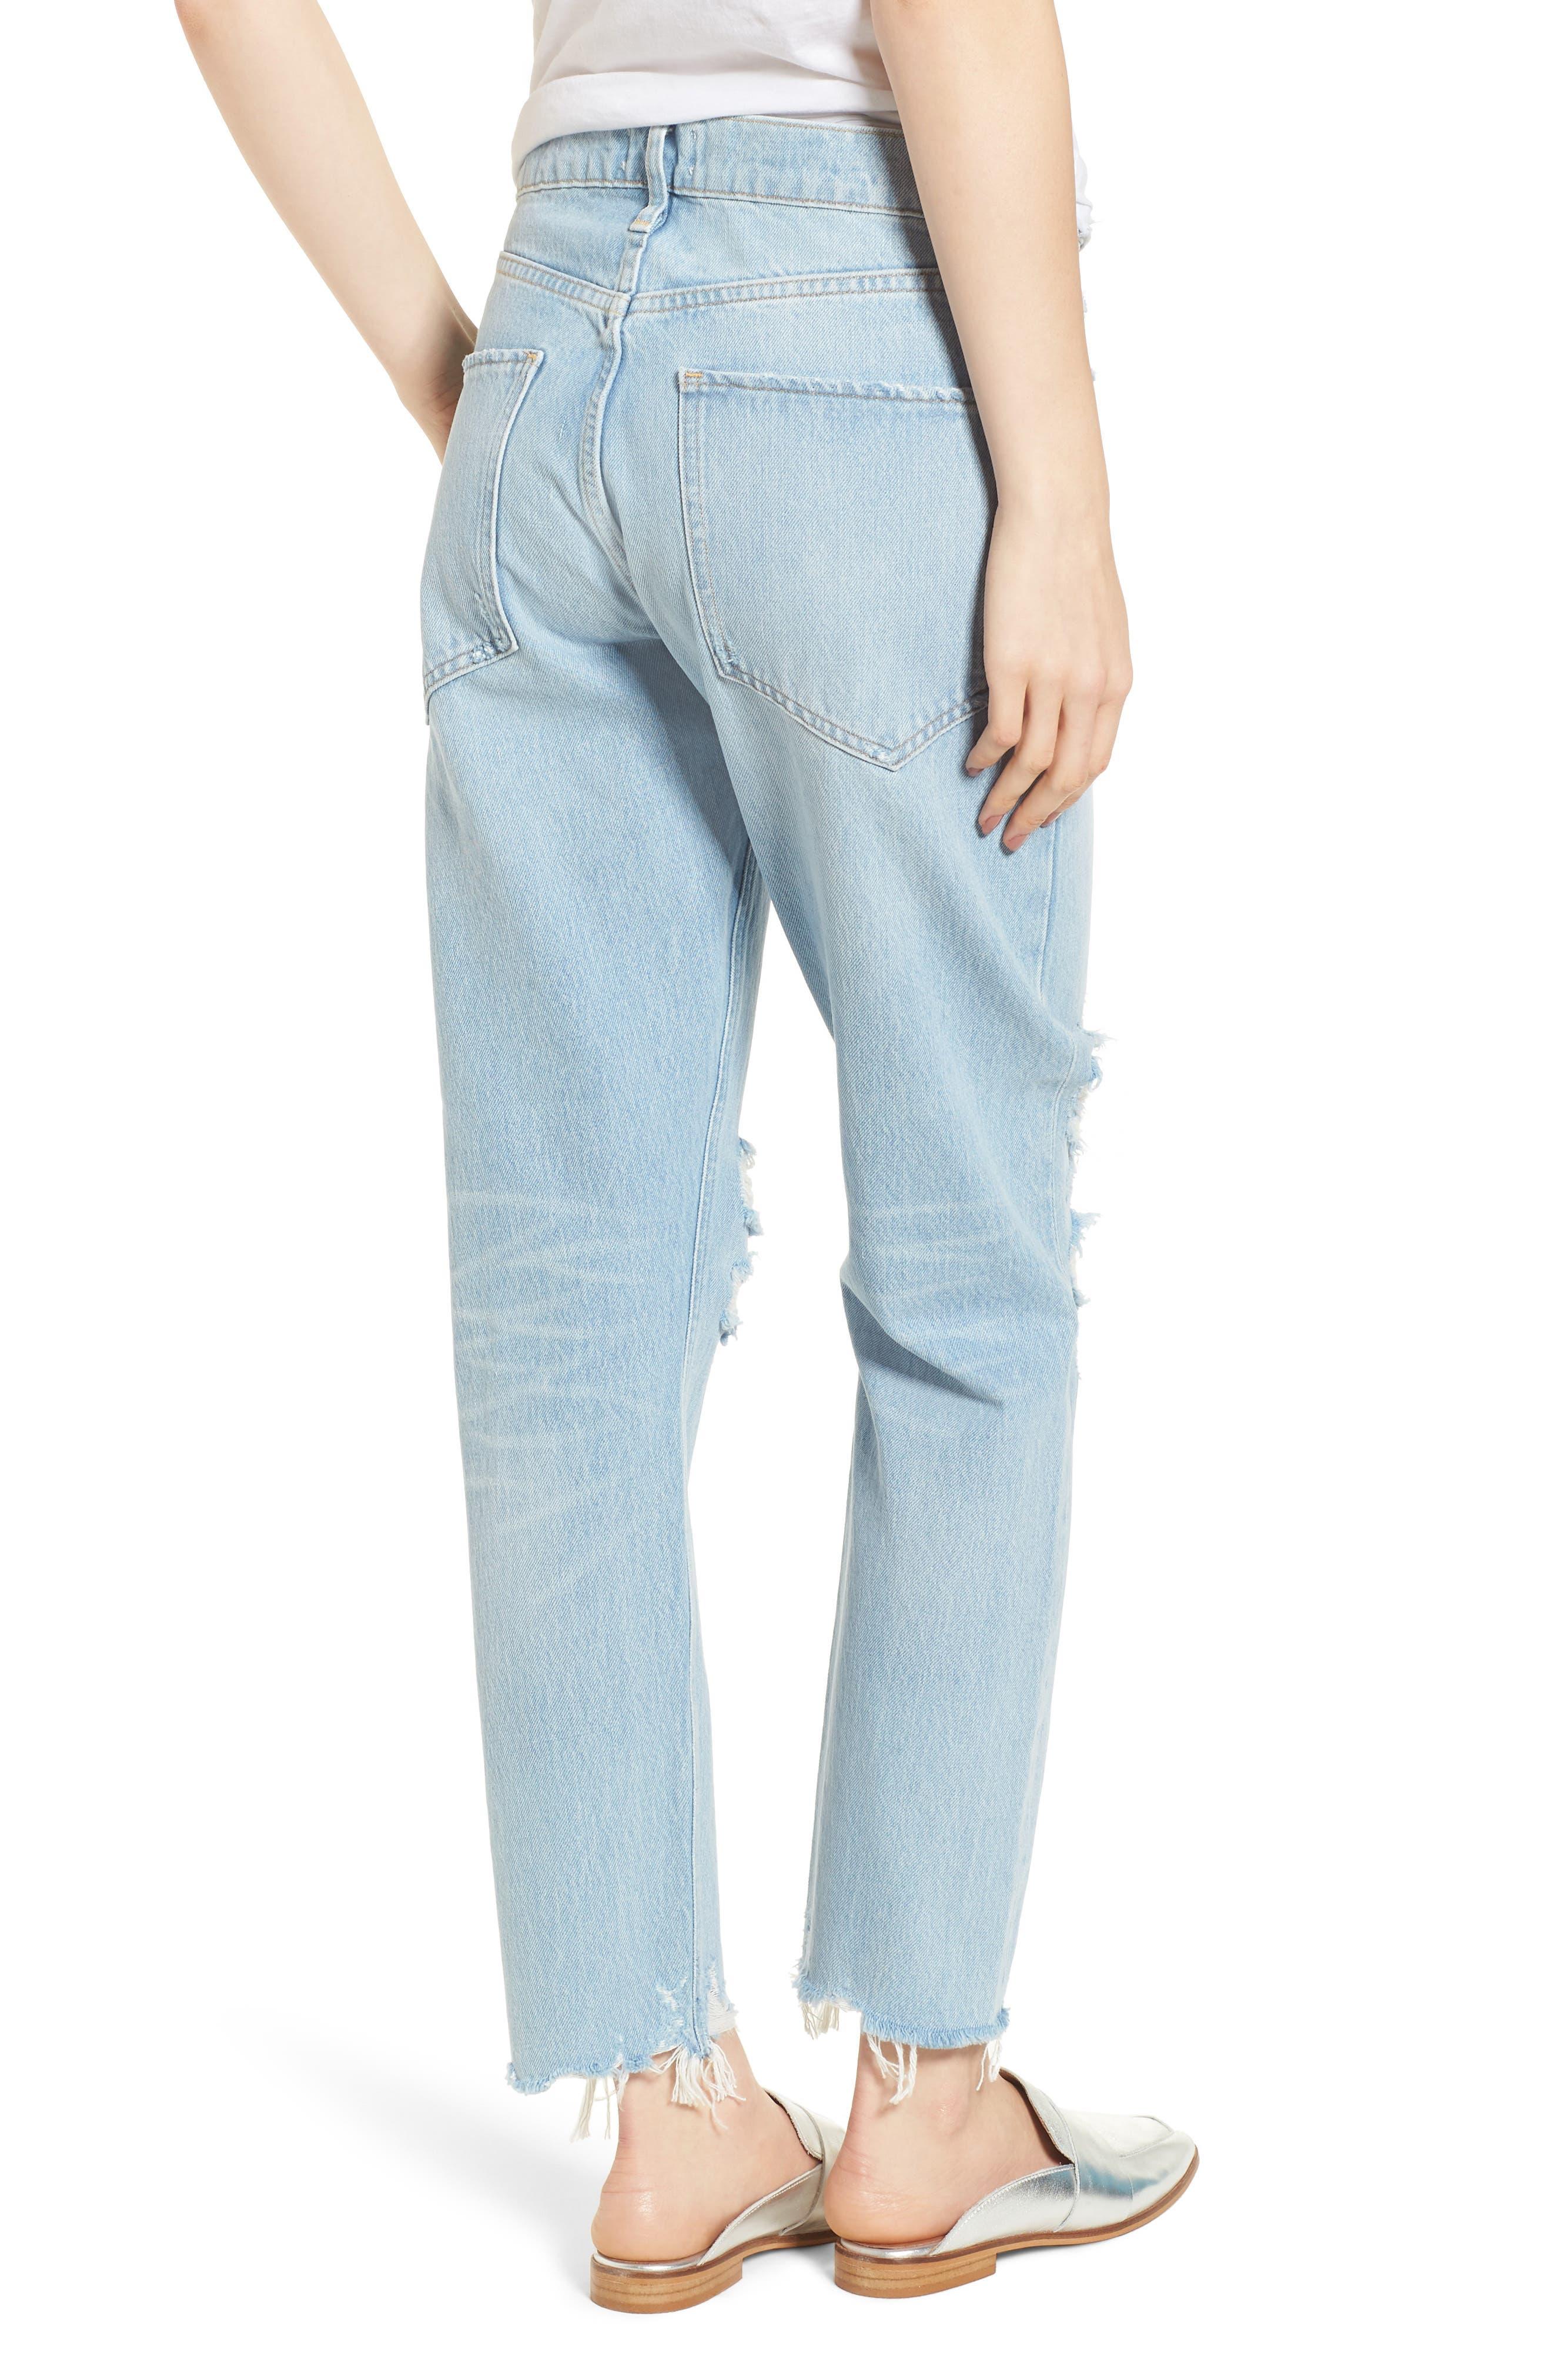 Jamie High Waist Ankle Jeans,                             Alternate thumbnail 2, color,                             Temper